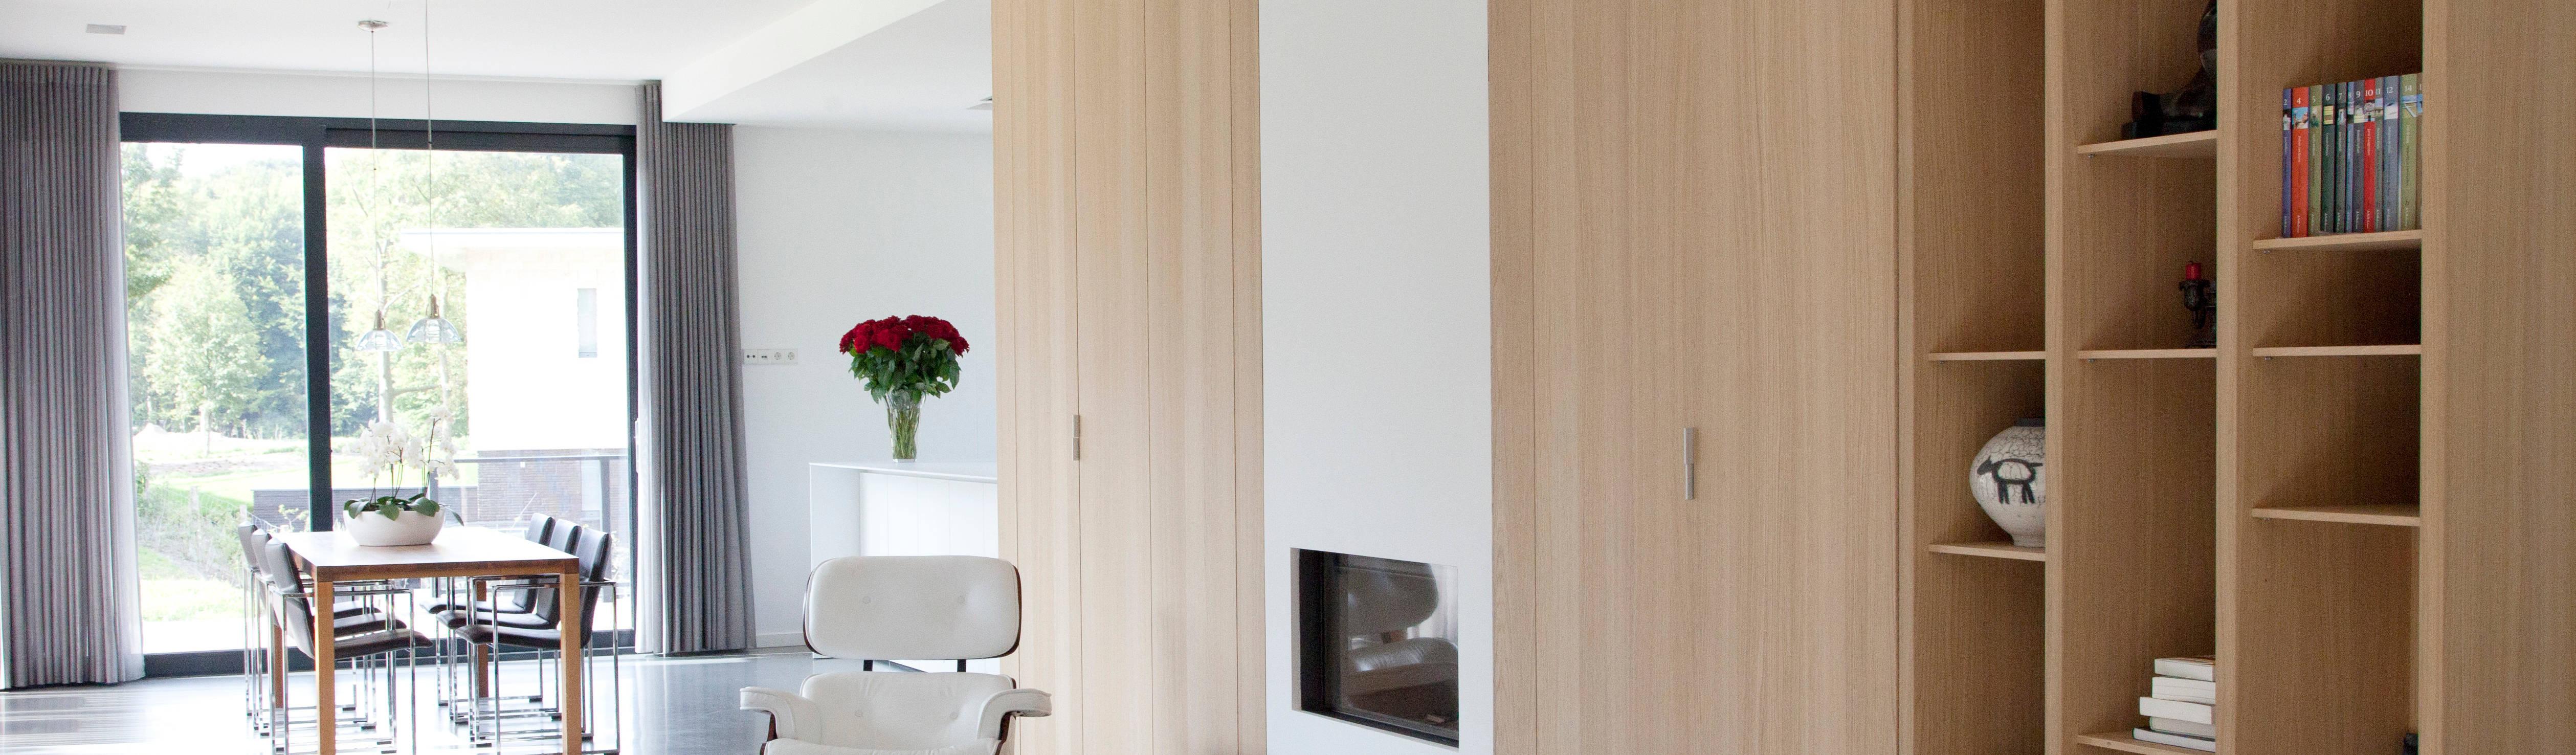 Moderne villa door archstudio architecten villa 39 s en interieur homify - Moderne entreehal ...